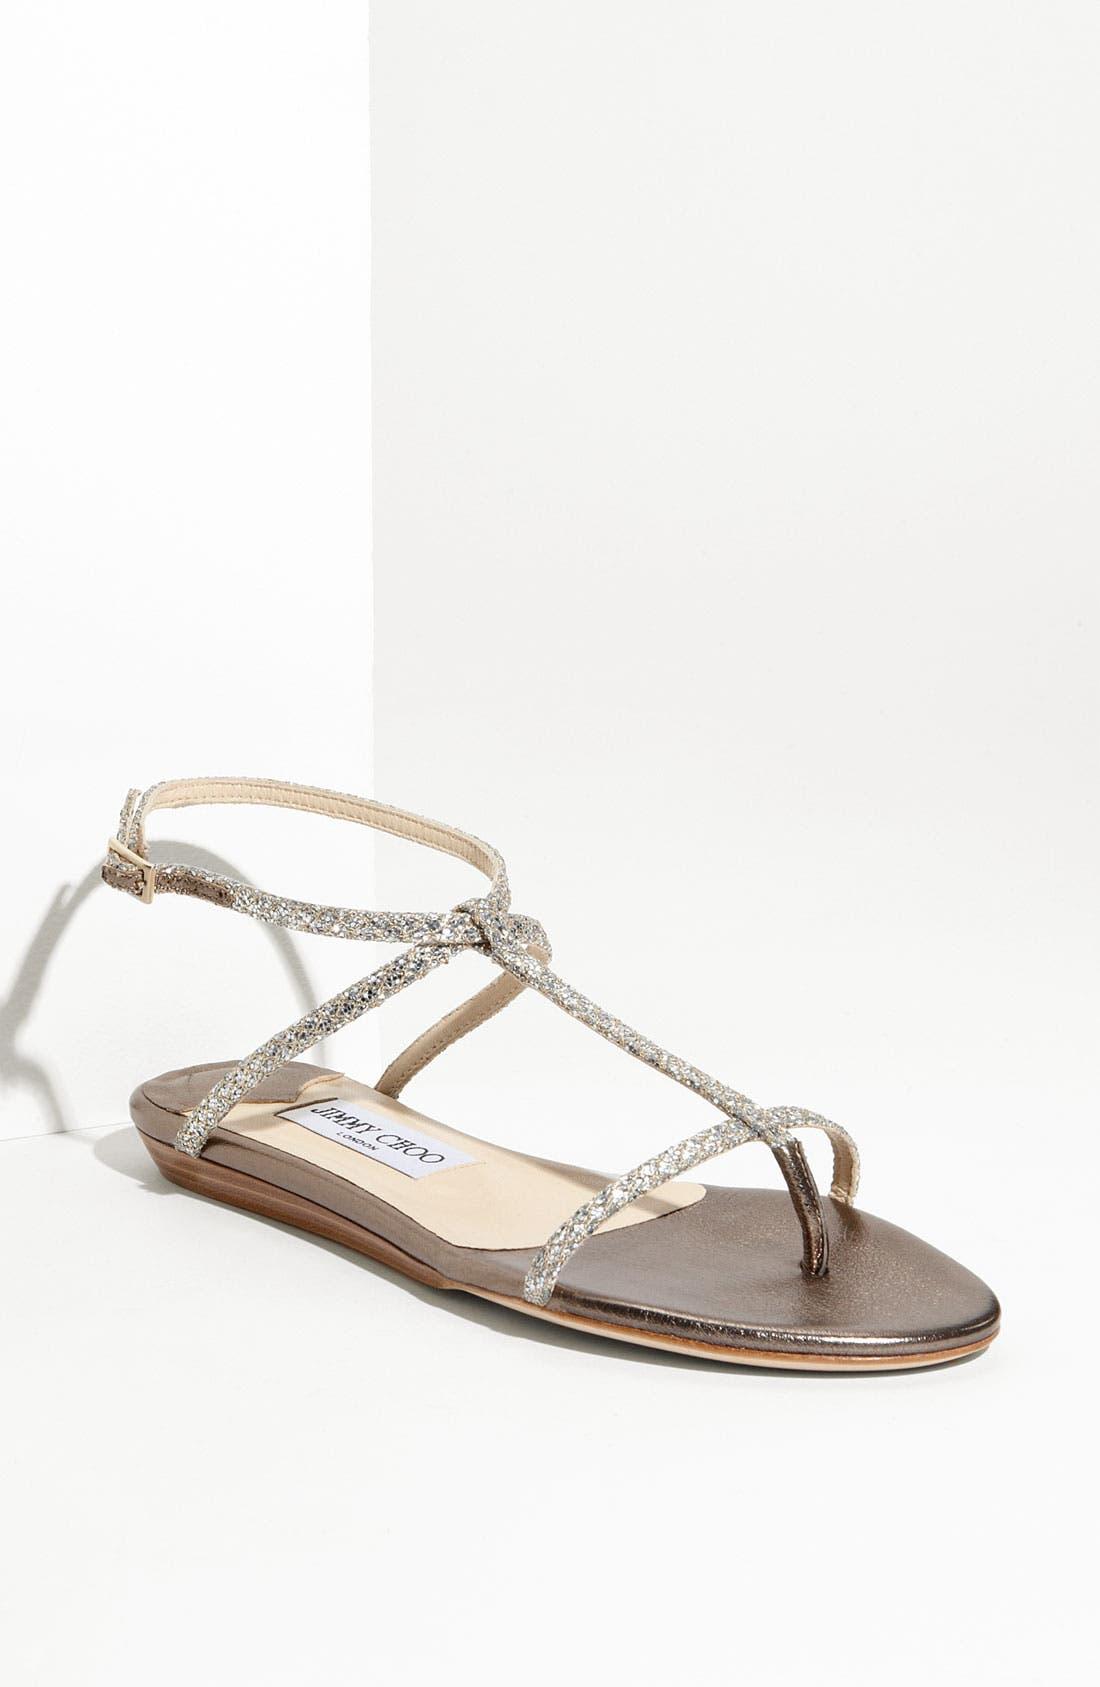 Alternate Image 1 Selected - Jimmy Choo 'Fiona' Sandal